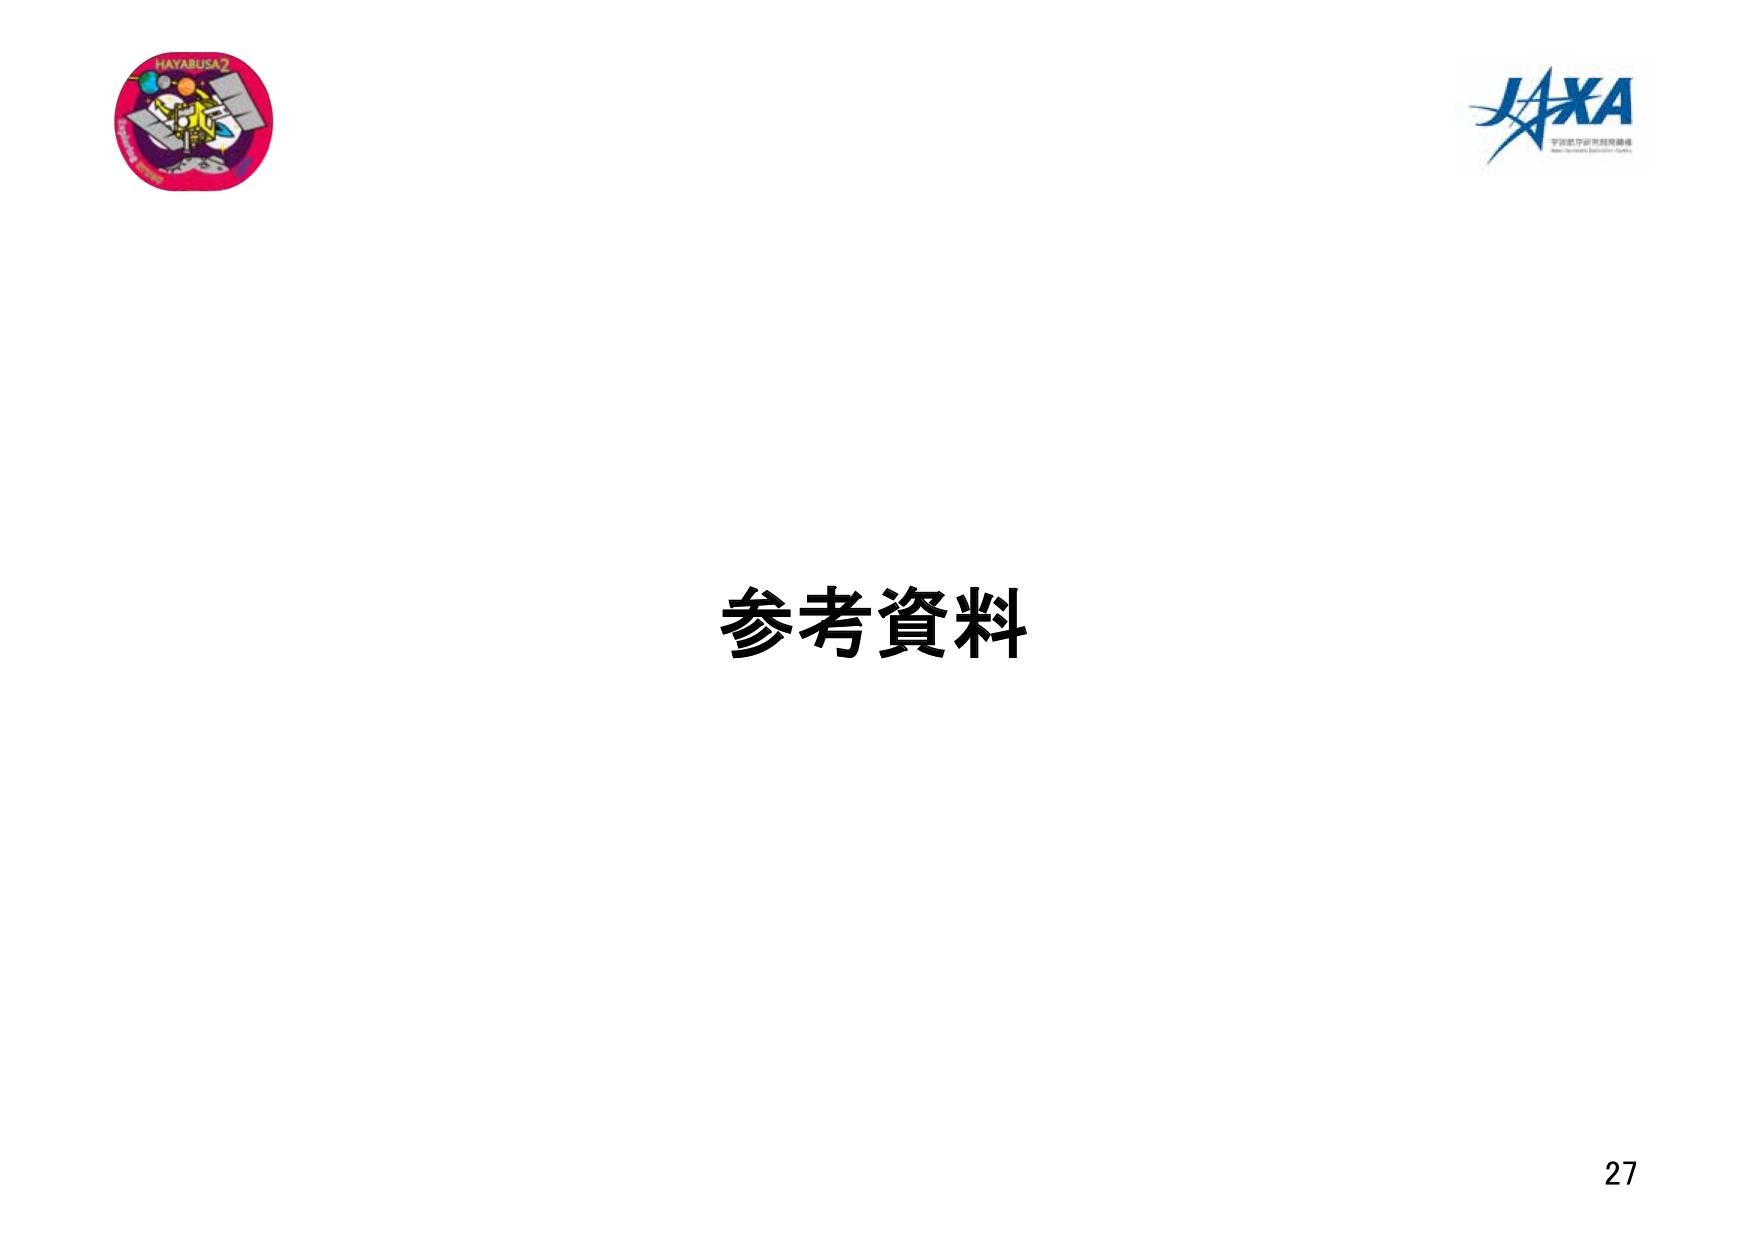 f:id:Imamura:20181011154006p:plain